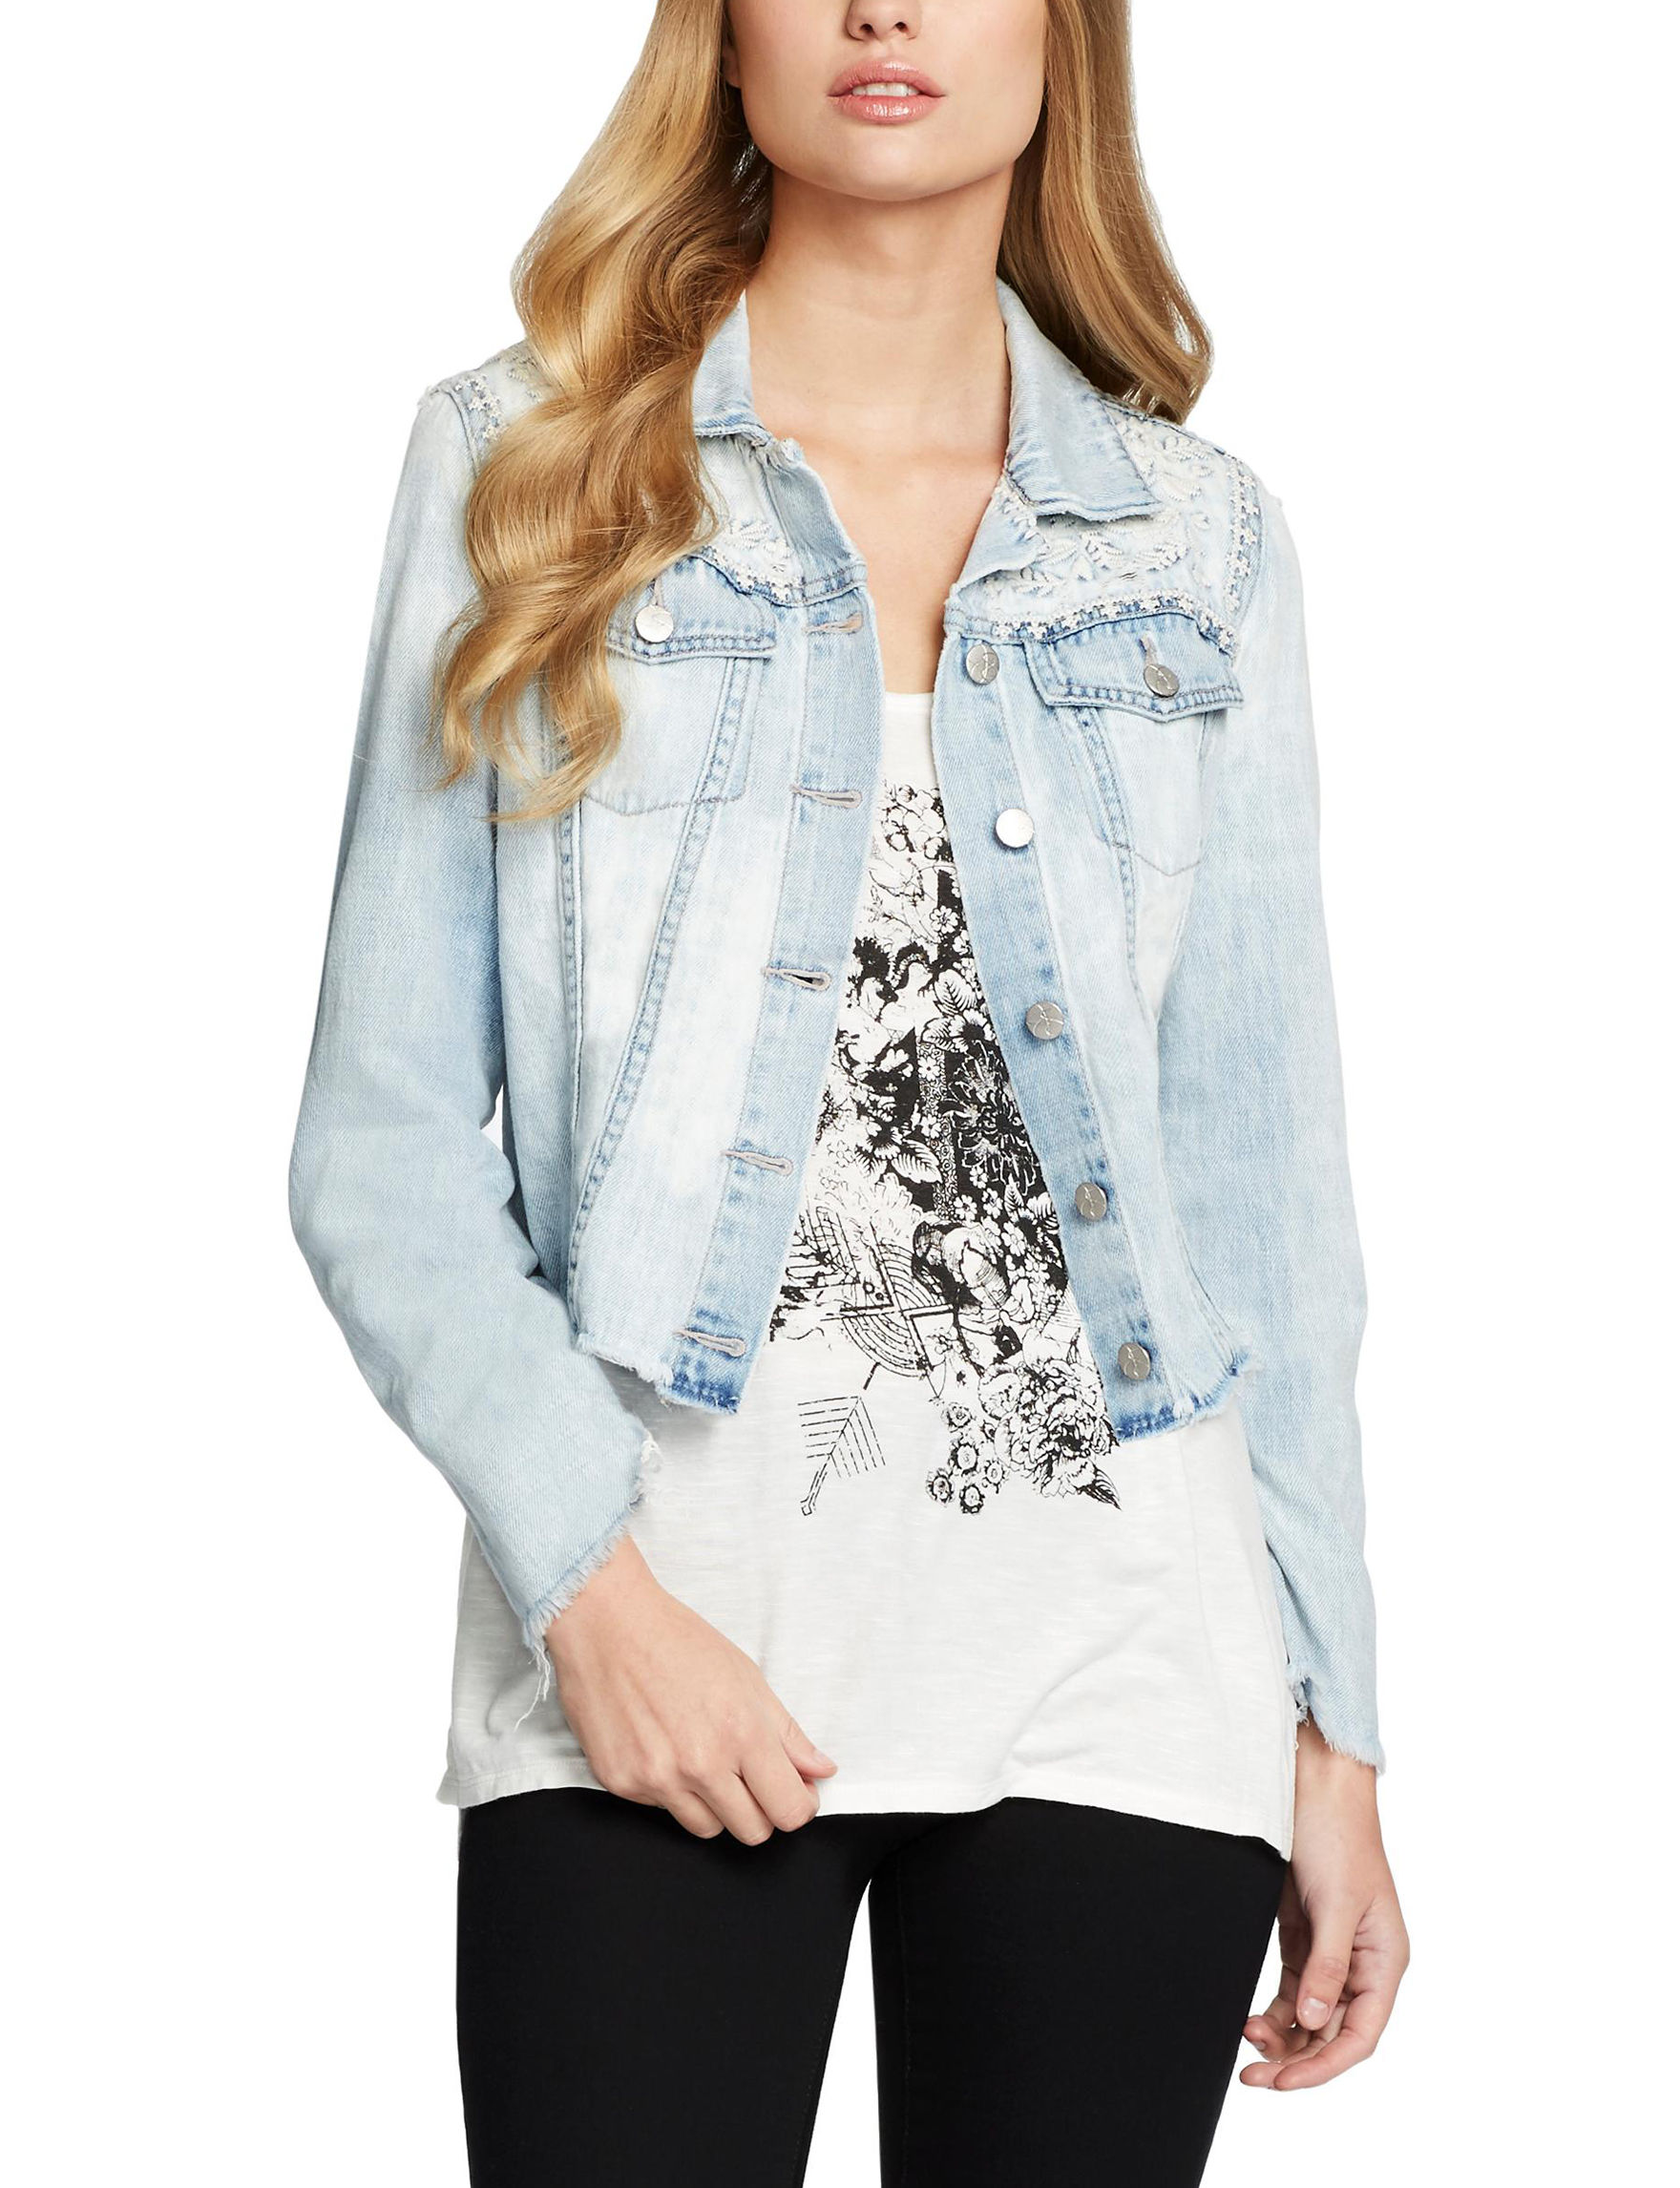 Jessica Simpson Blue Denim Jackets